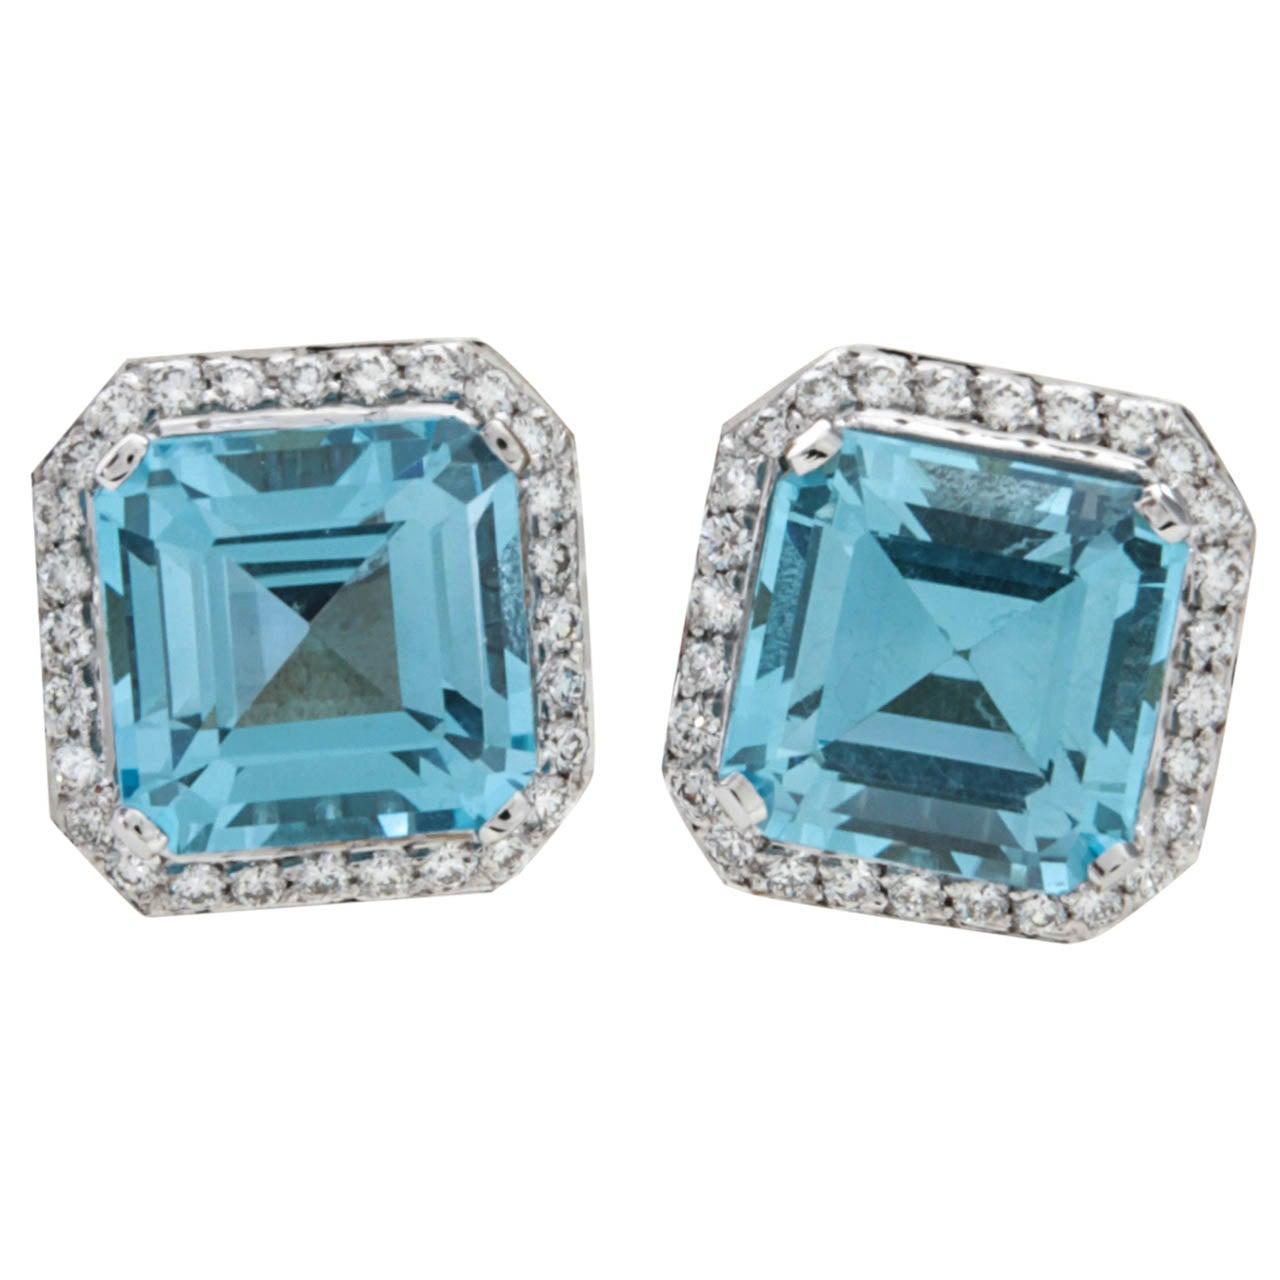 Stunning Blue Topaz Squared Diamond Earrings For Sale At